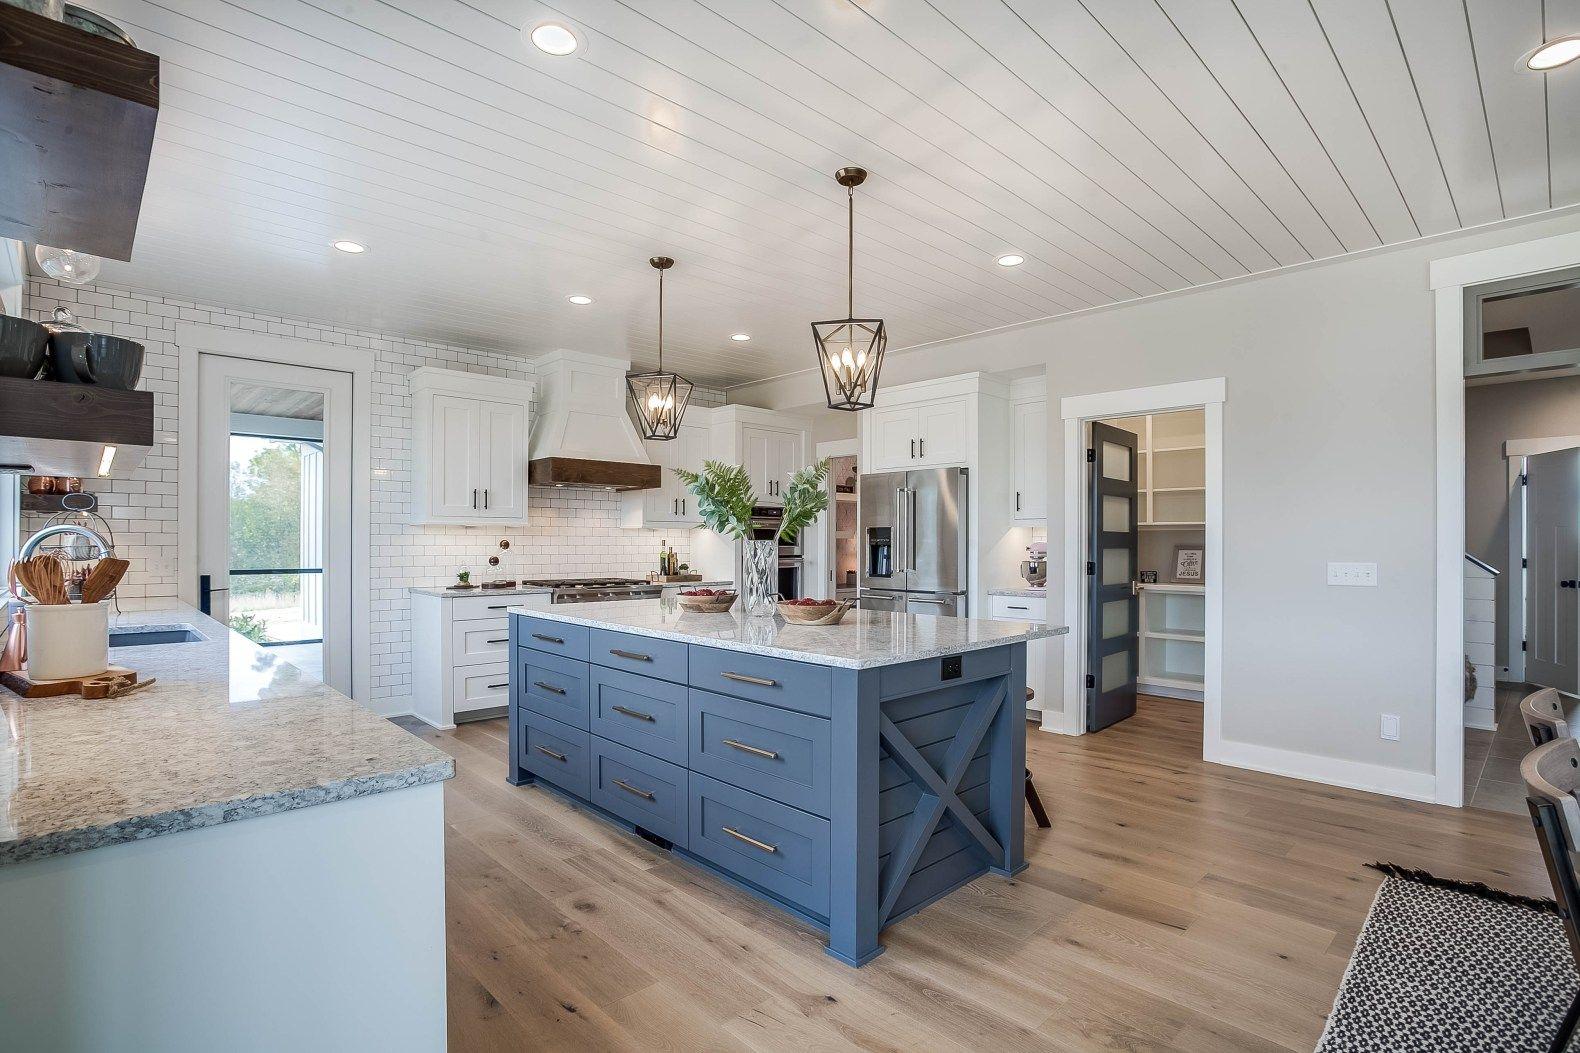 modern farmhouse kitchen with gray blue painted kitchen island eclectic farmhouse modern on farmhouse kitchen gray id=35237